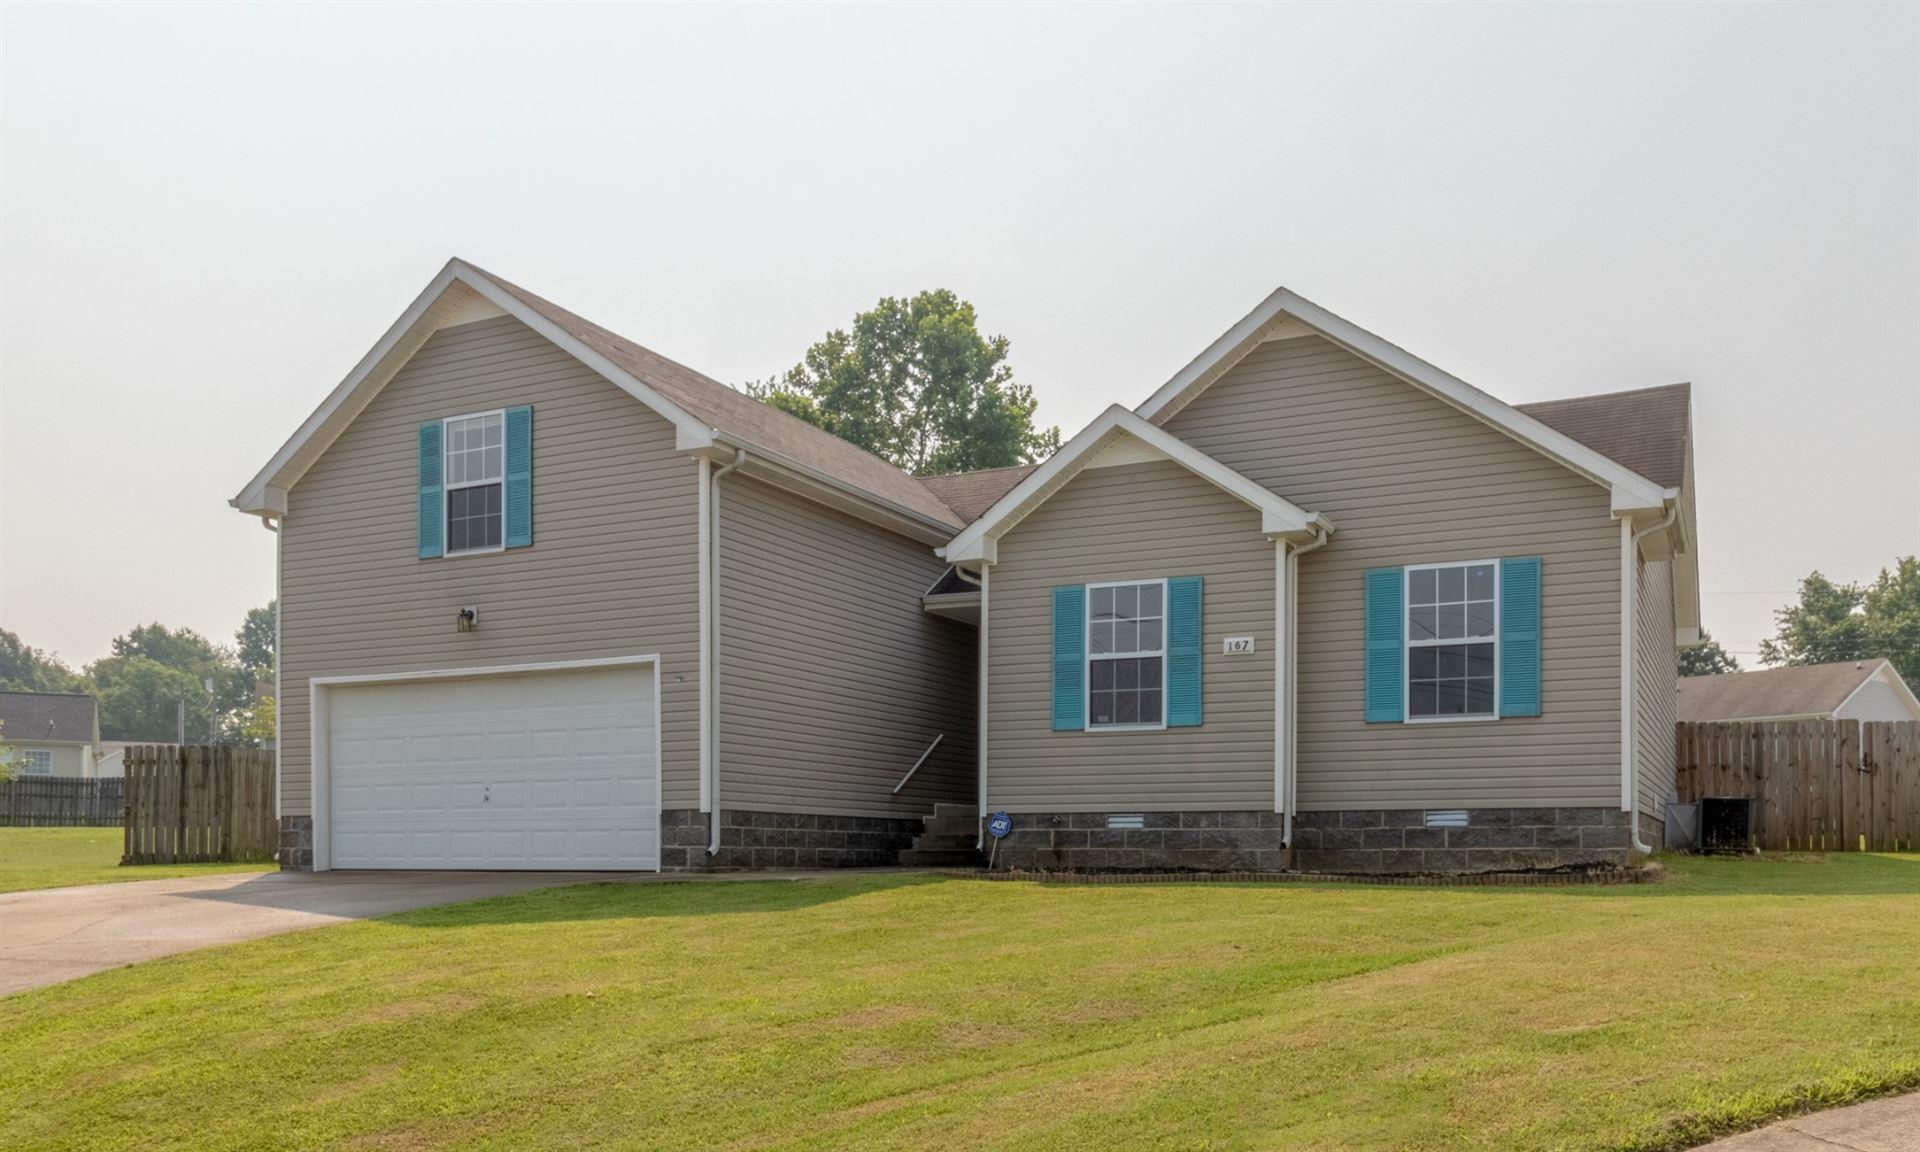 167 Appellate Ct, Clarksville, TN 37042 - MLS#: 2274889